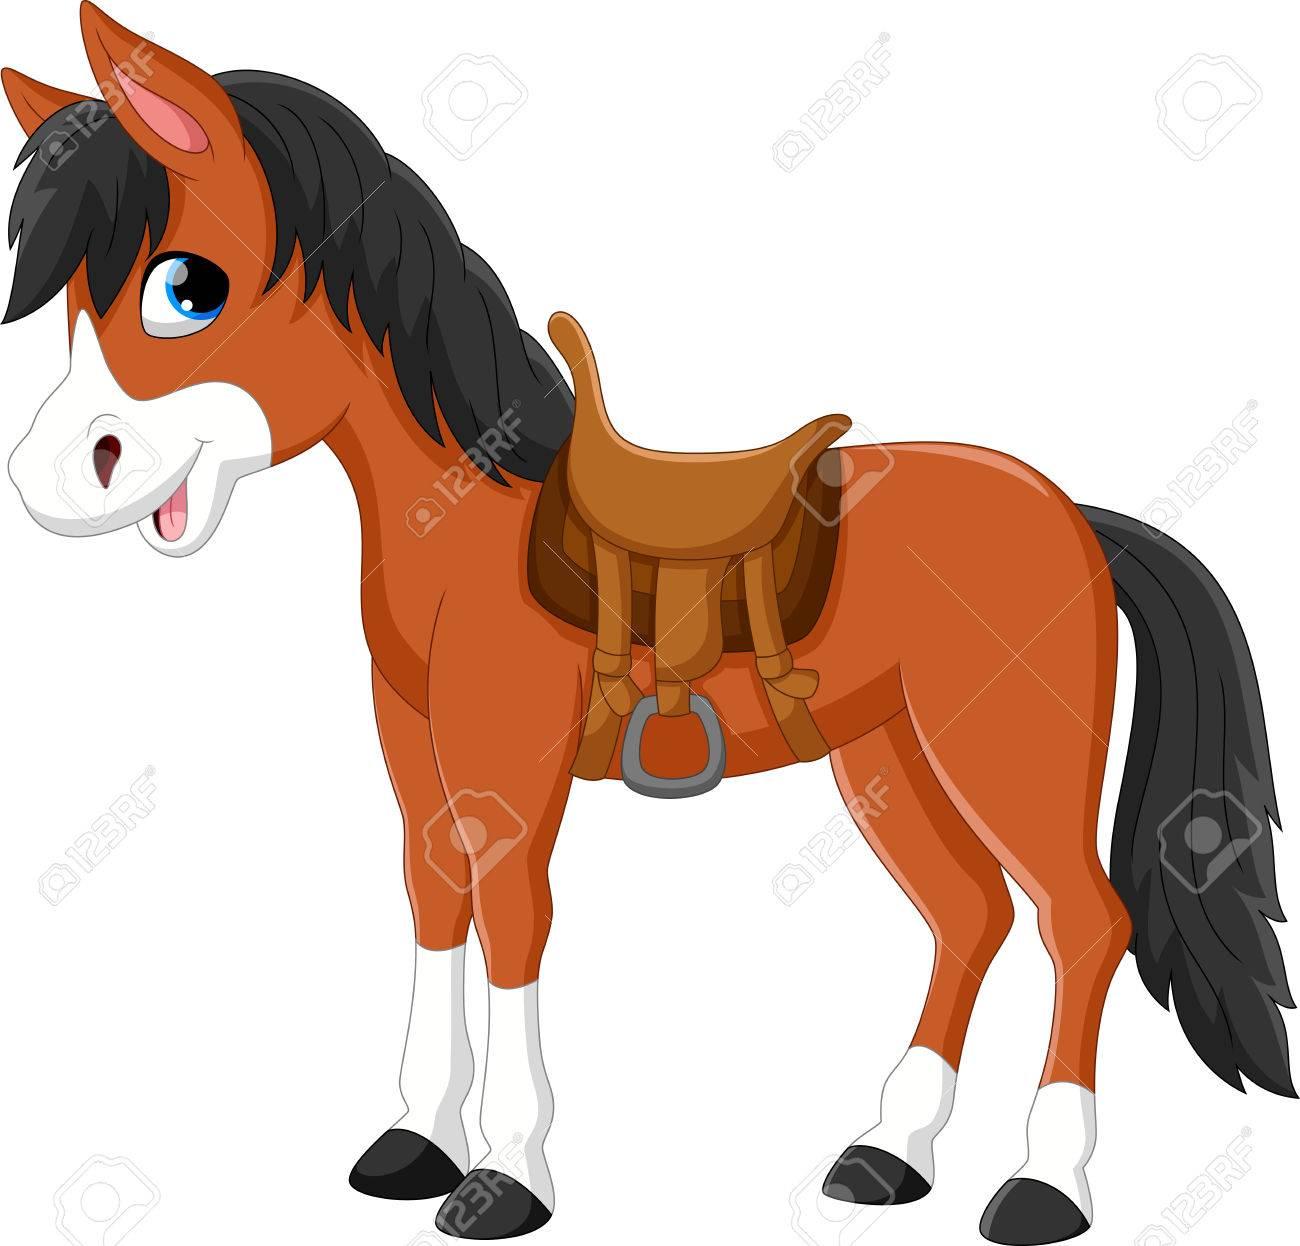 Illustration of a beautiful horse isolated on white background - 55360469